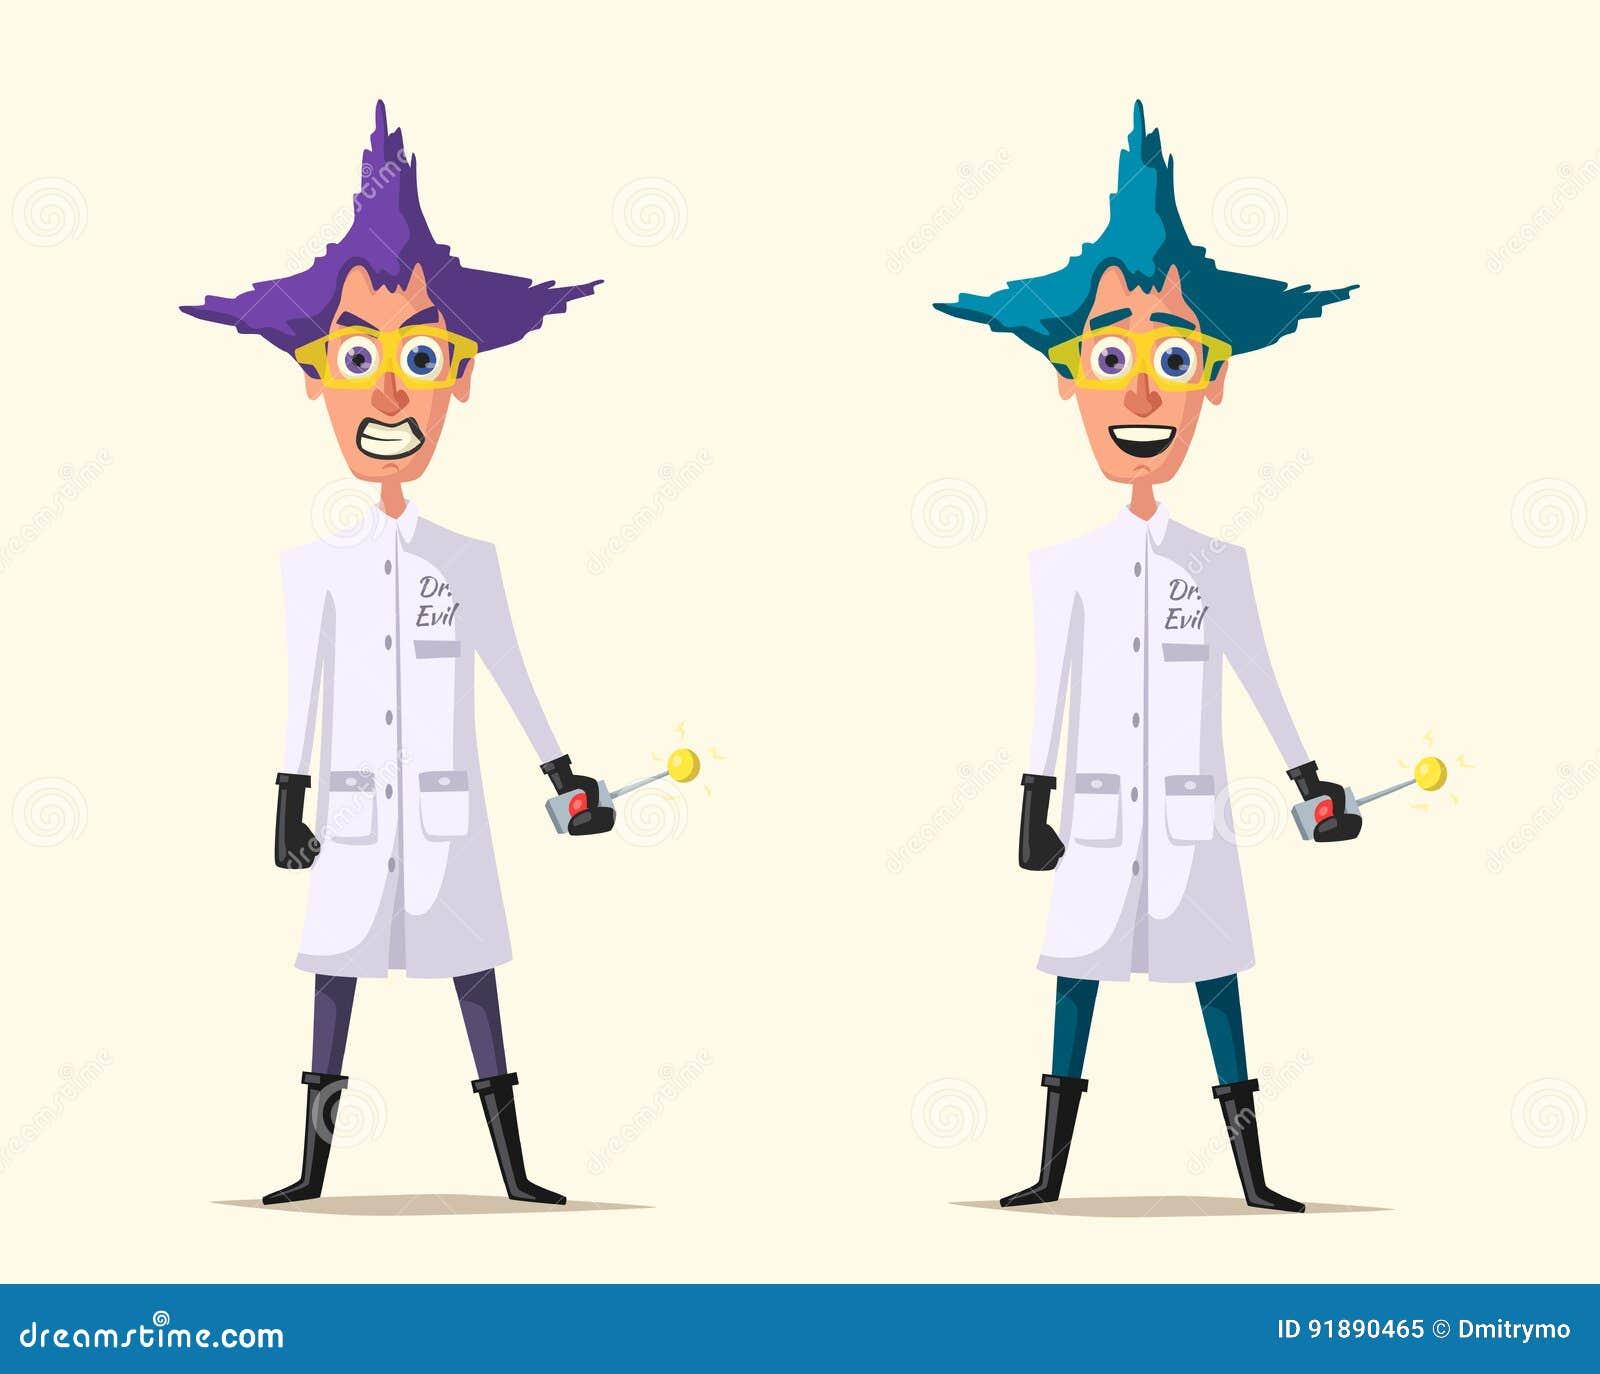 Crazy Scientist Funny Character Cartoon Vector Illustration Mad Professor Science Experiment Remote Controller Doctor Evil Bad Man